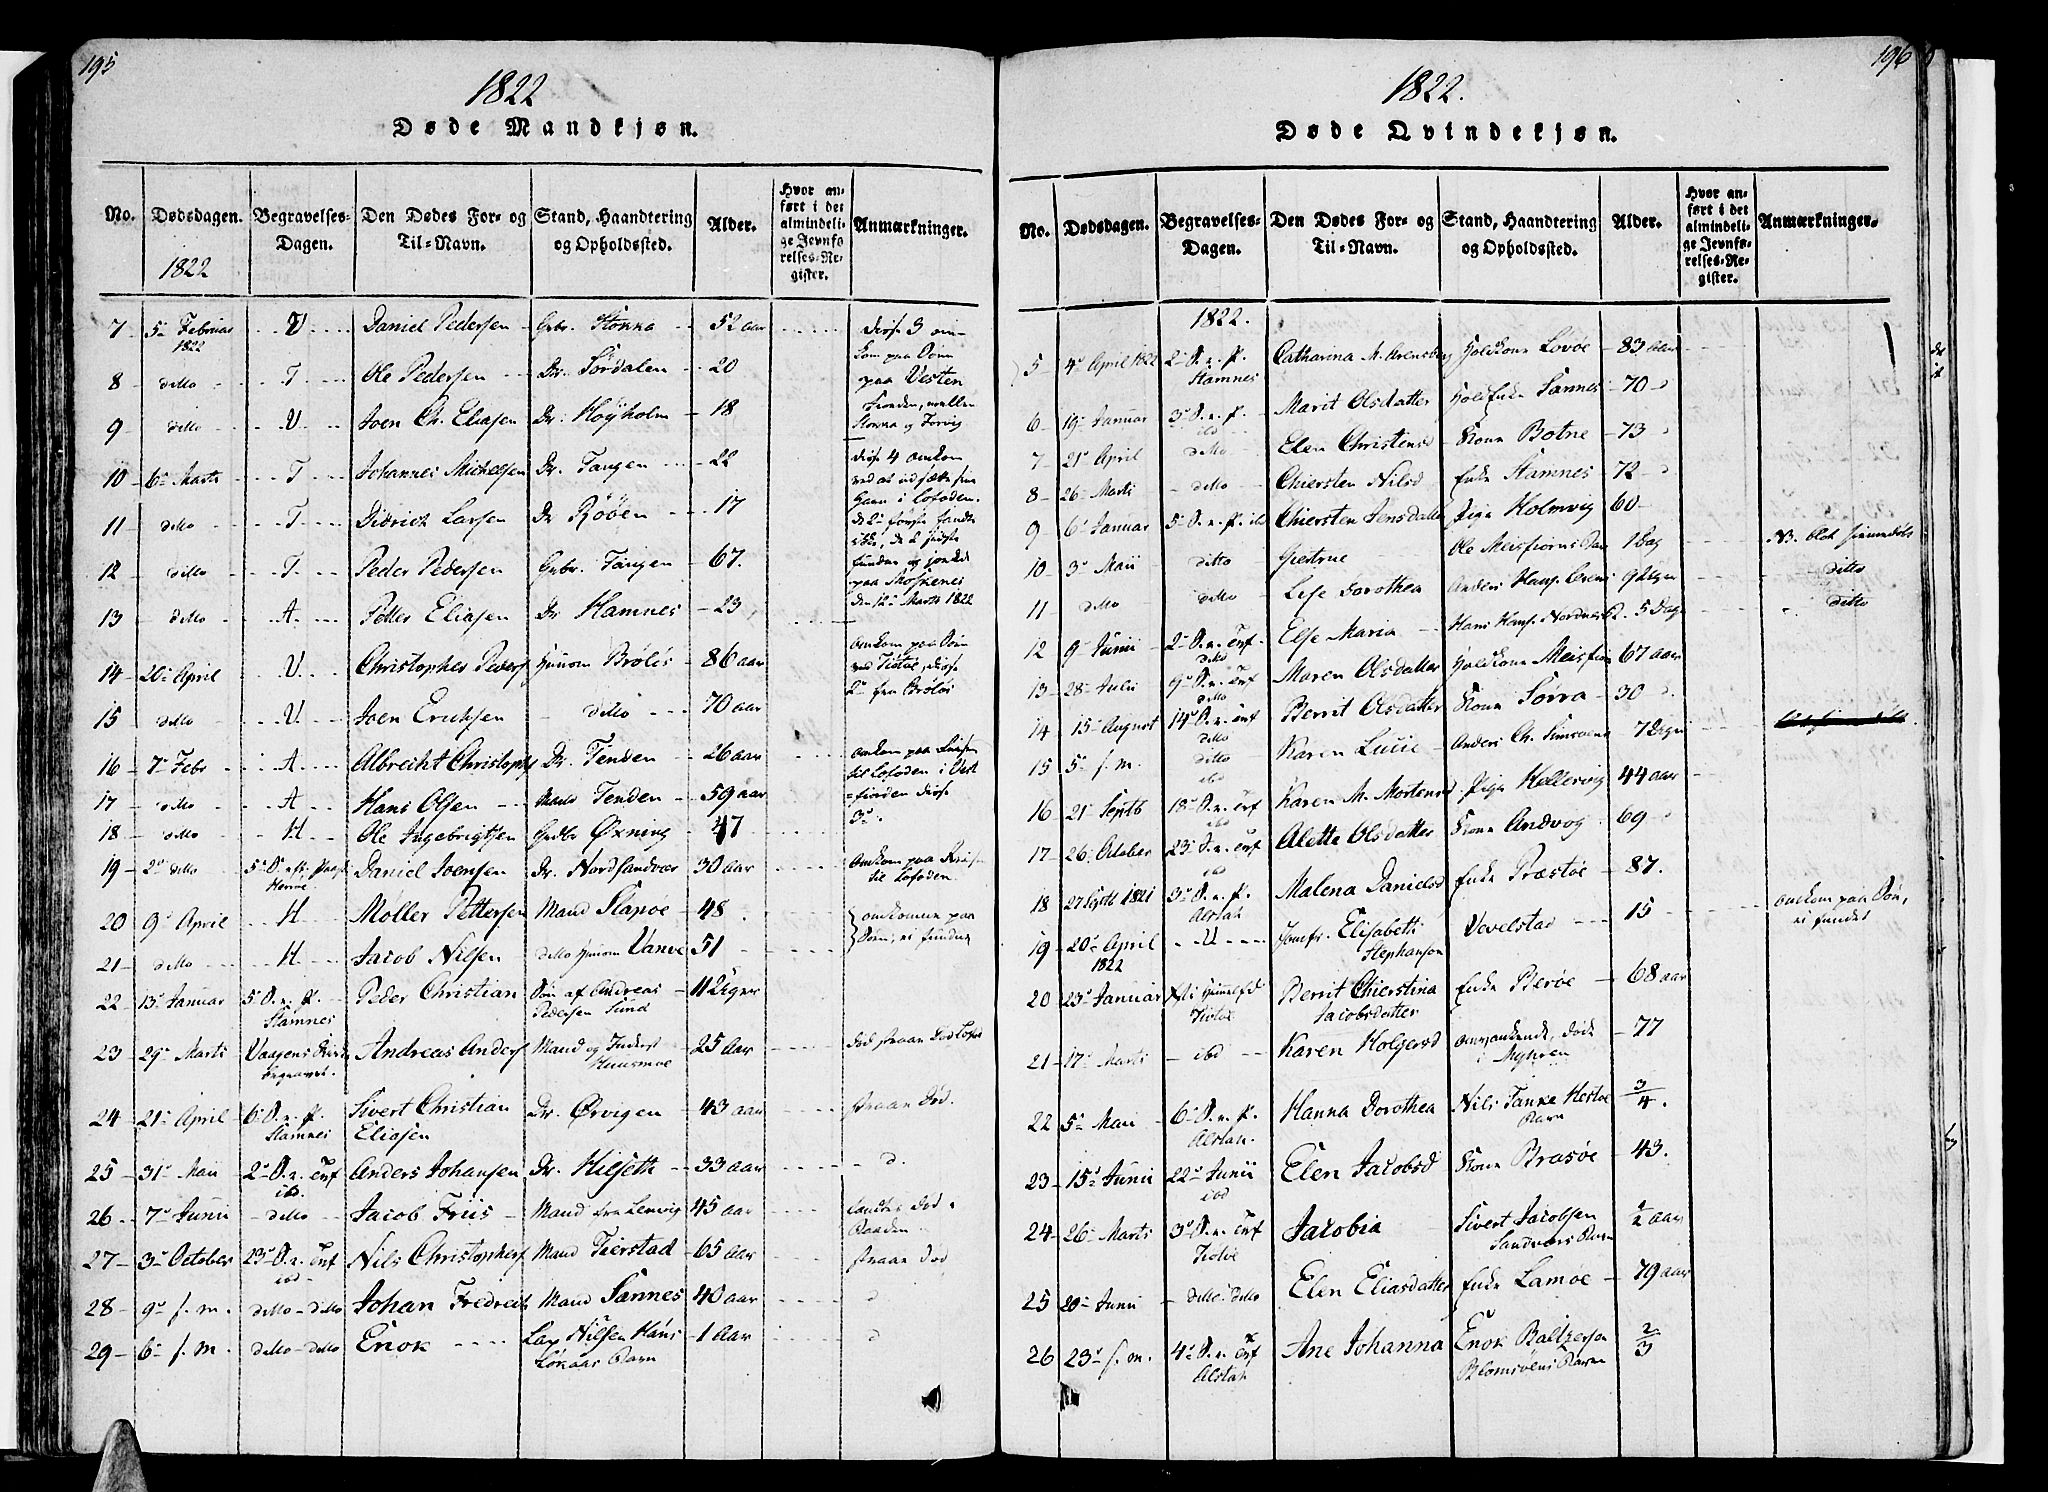 SAT, Ministerialprotokoller, klokkerbøker og fødselsregistre - Nordland, 830/L0445: Ministerialbok nr. 830A09, 1820-1830, s. 195-196